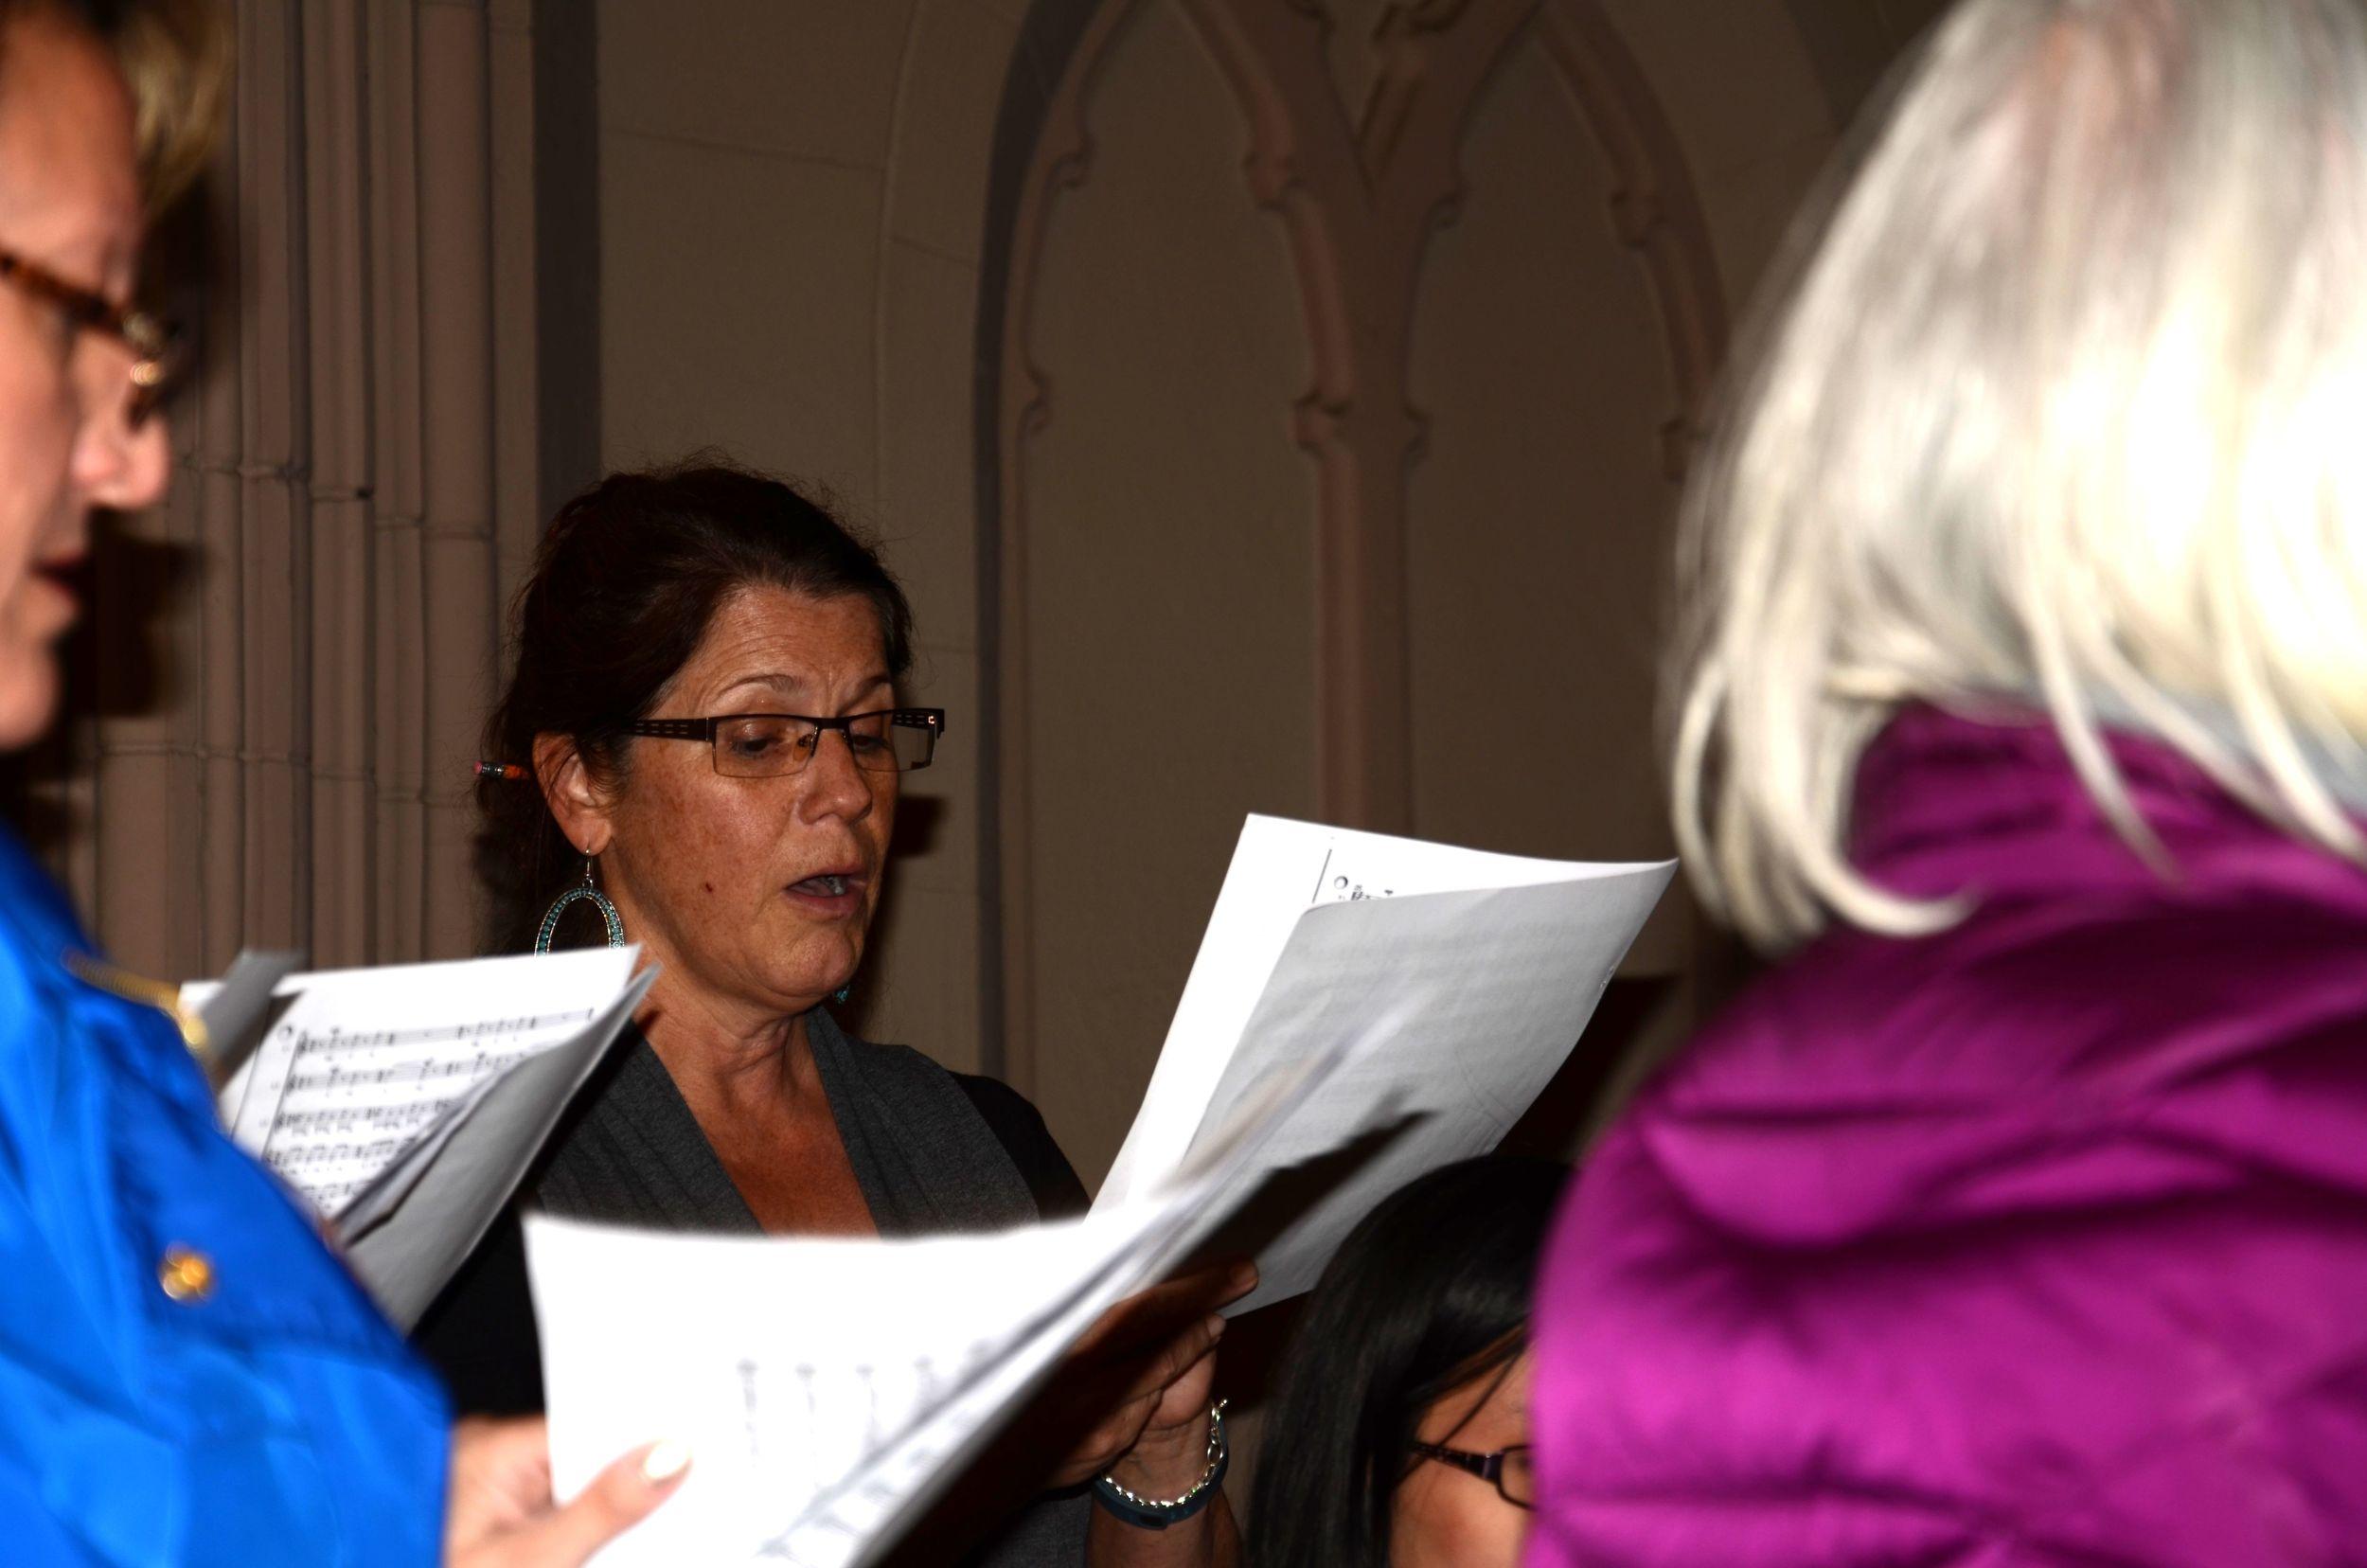 Vittoria Ensembl 2015-05-21 2159 rehearsal St Dom.JPG